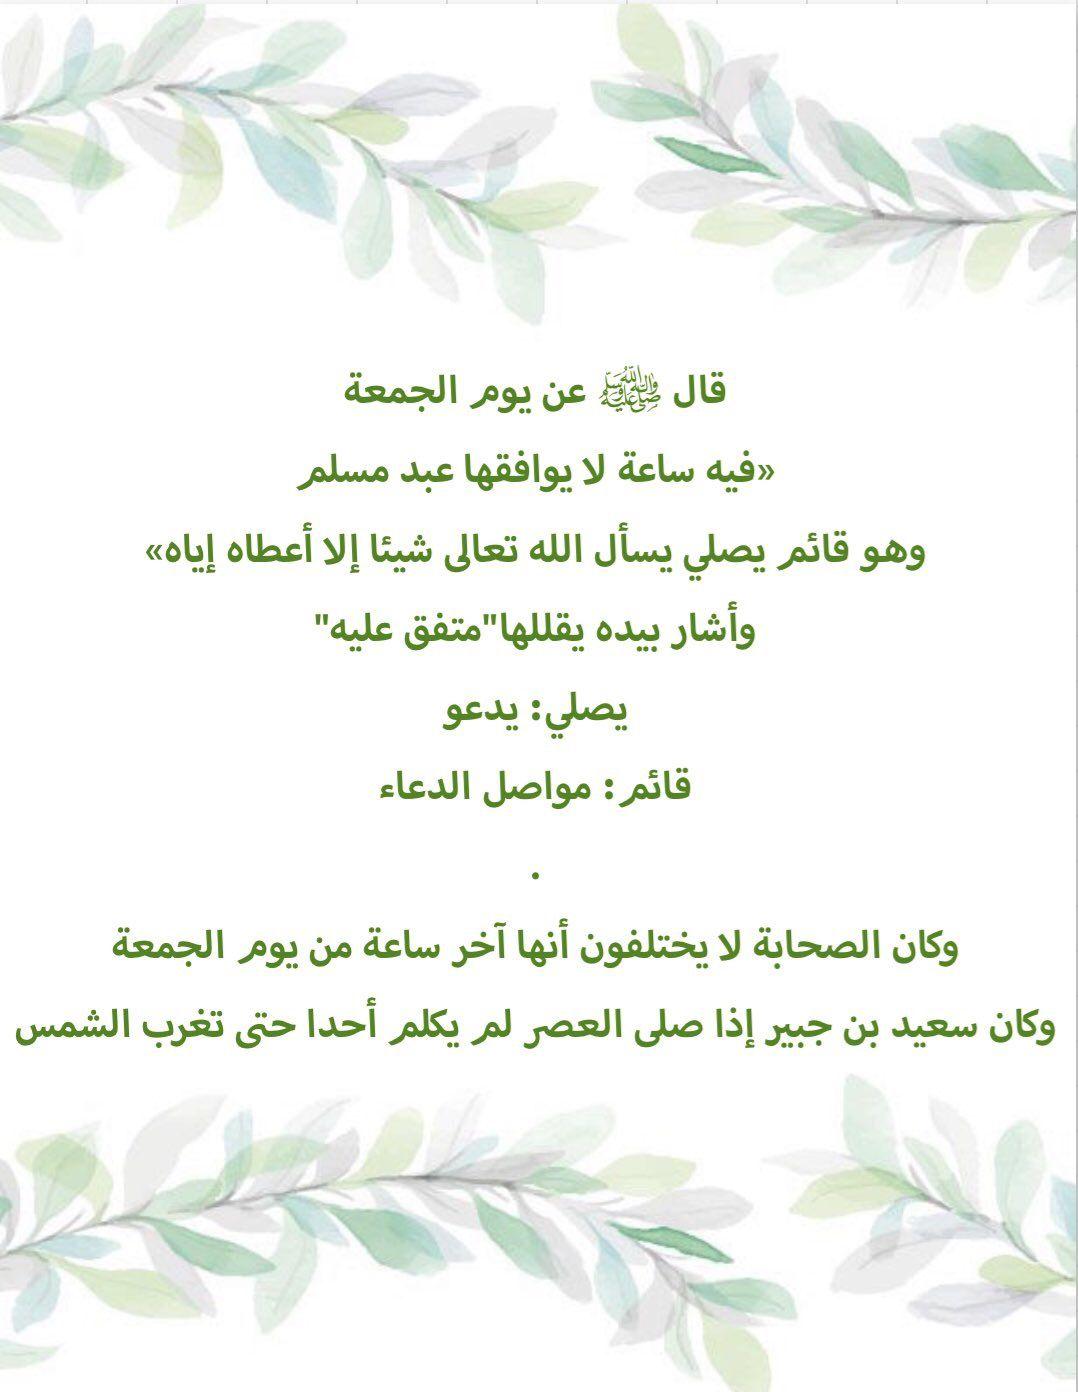 يوم الجمعة Cover Photo Quotes Islamic Quotes Quran Islamic Quotes